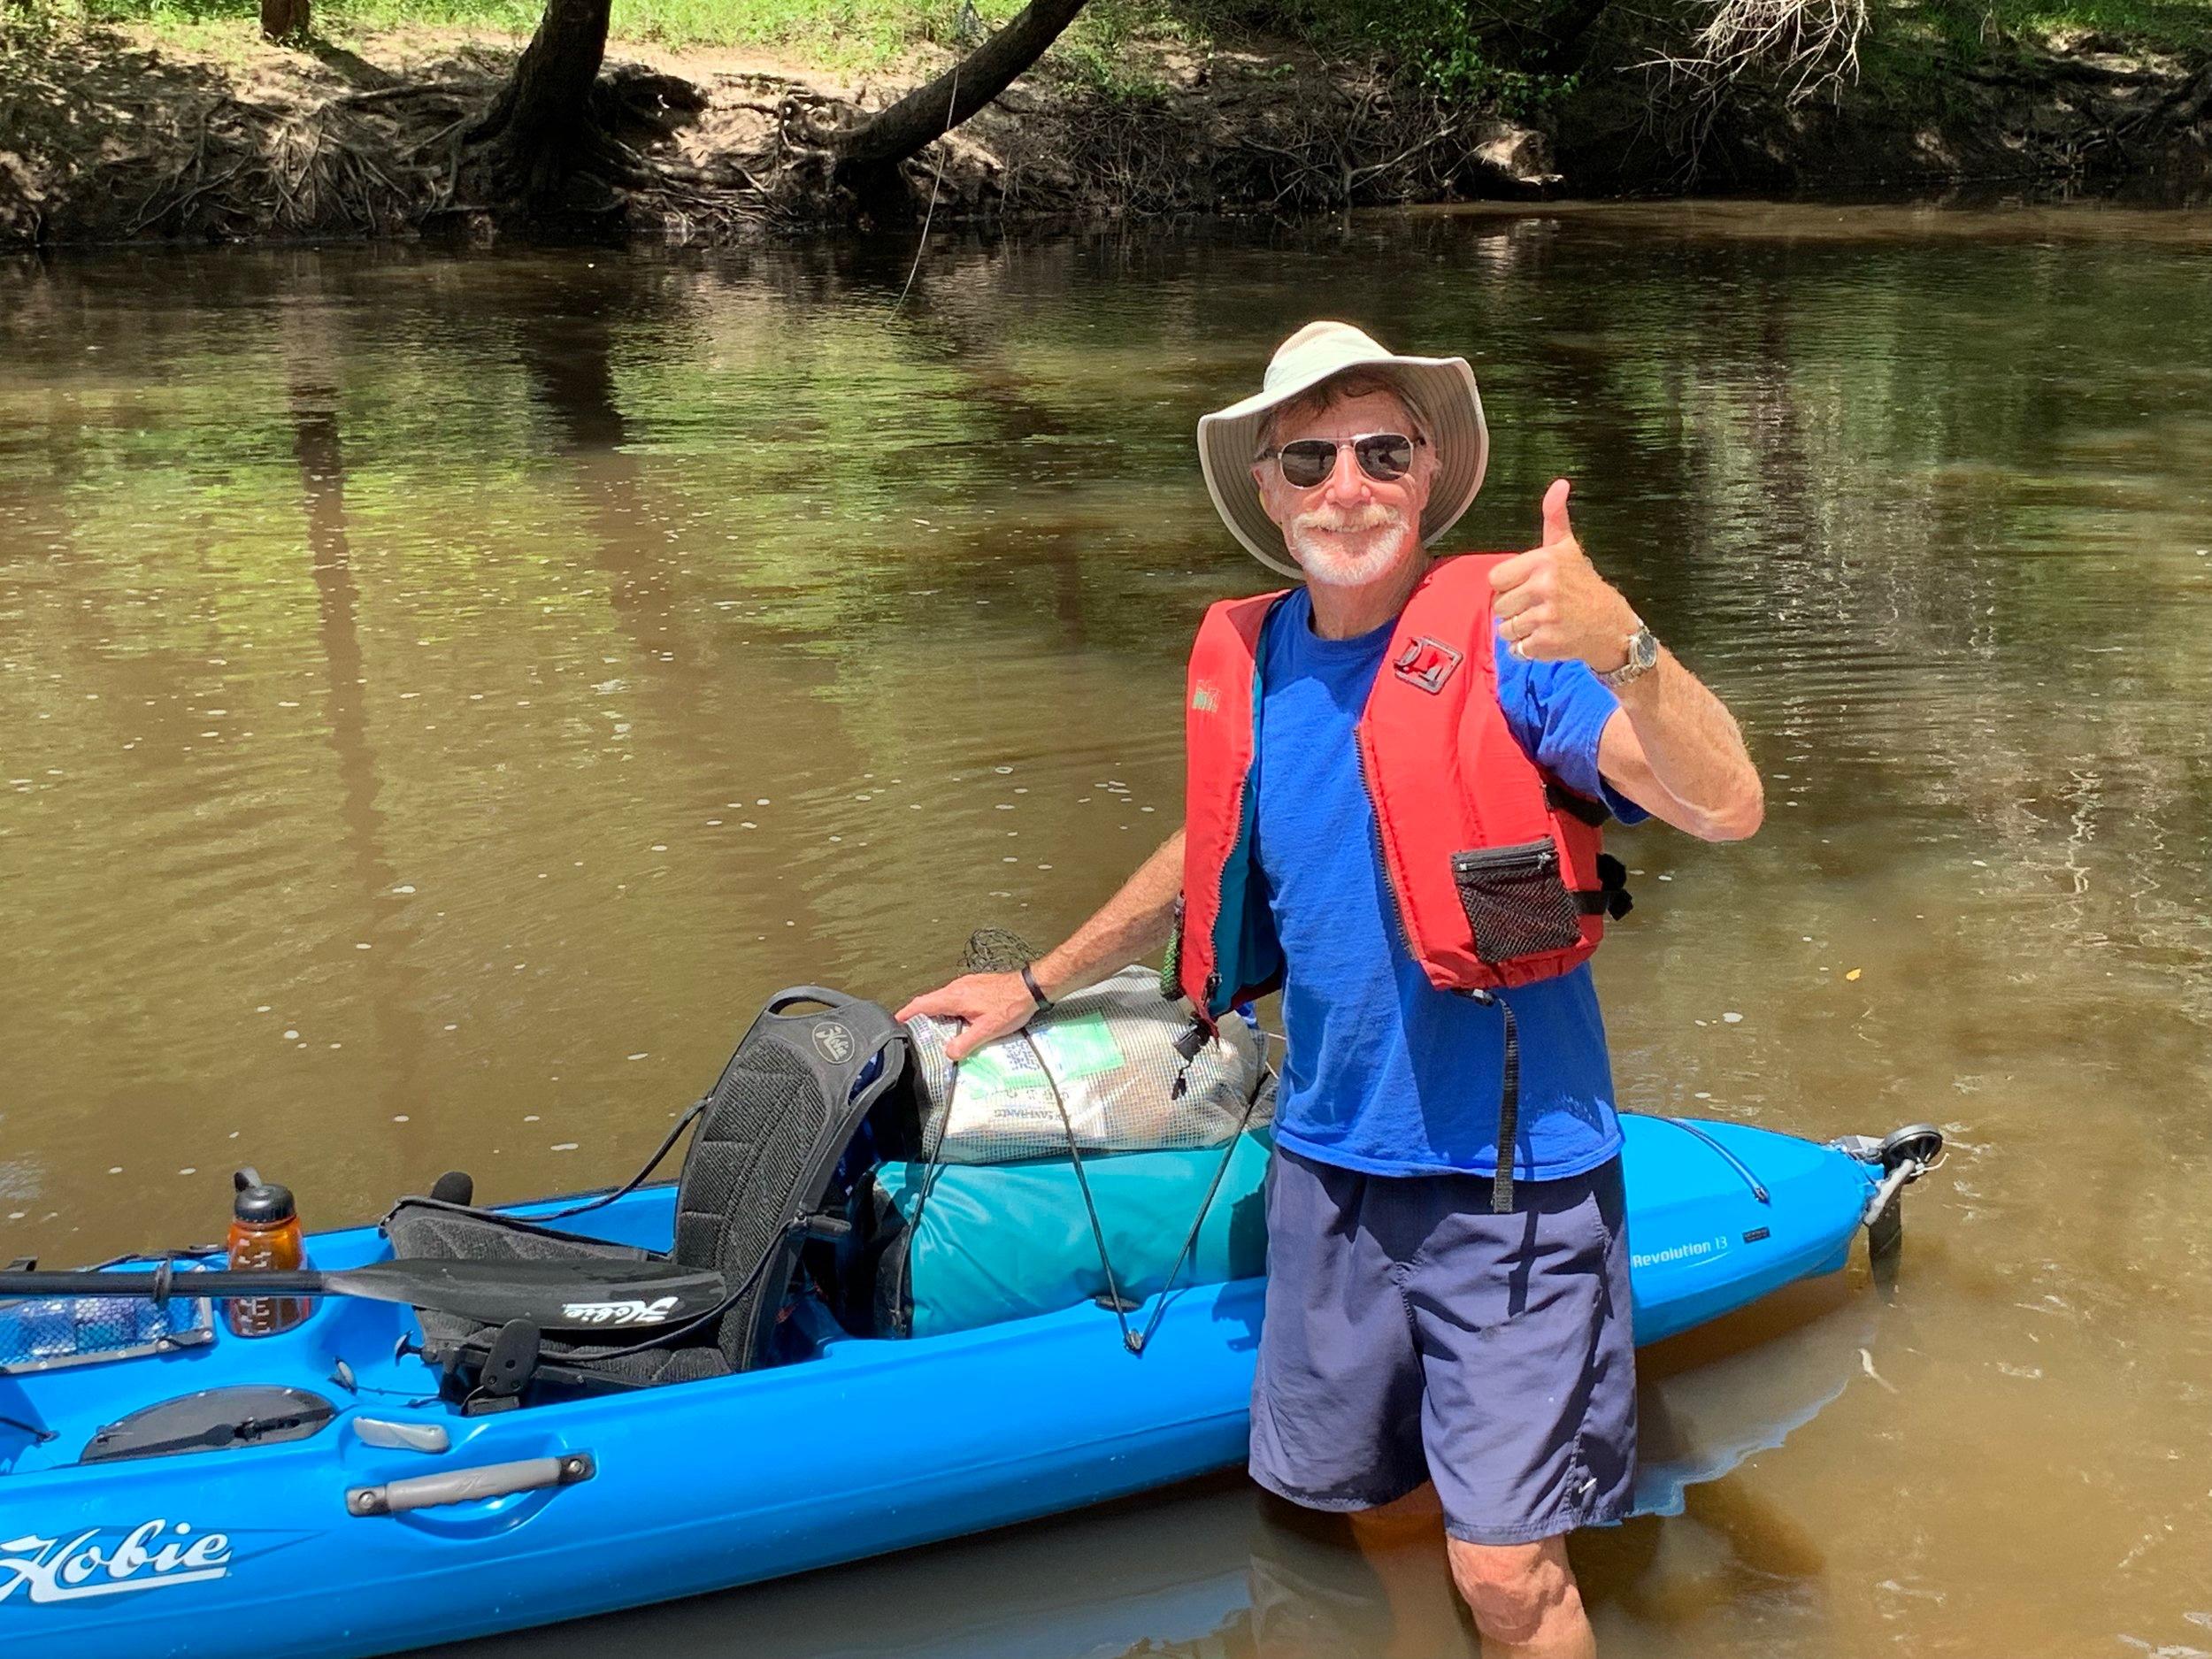 A Man's Kayaking Trip alone|positively jane